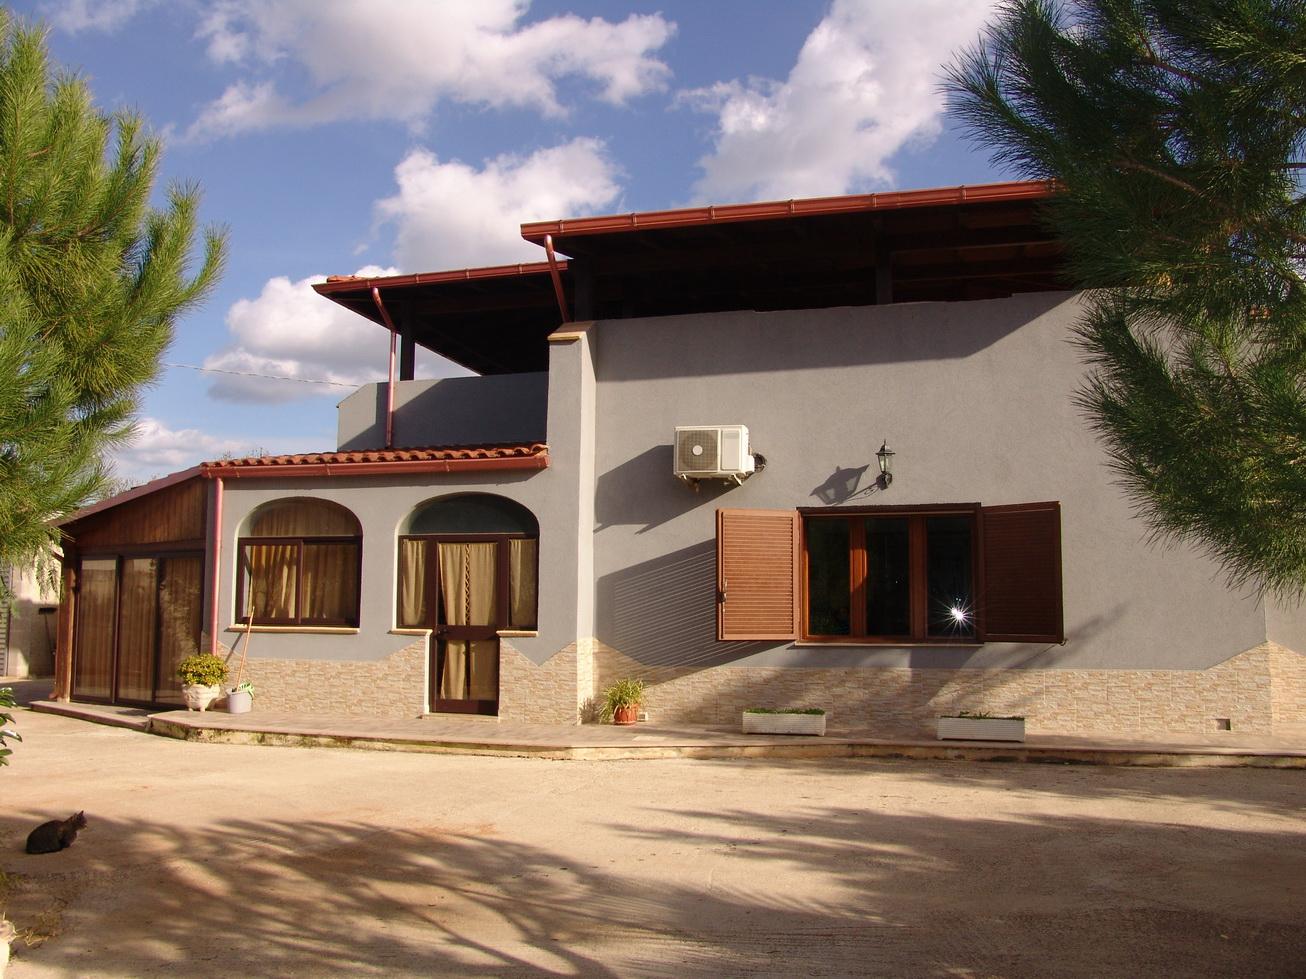 Villa in contrada Formica rif.318